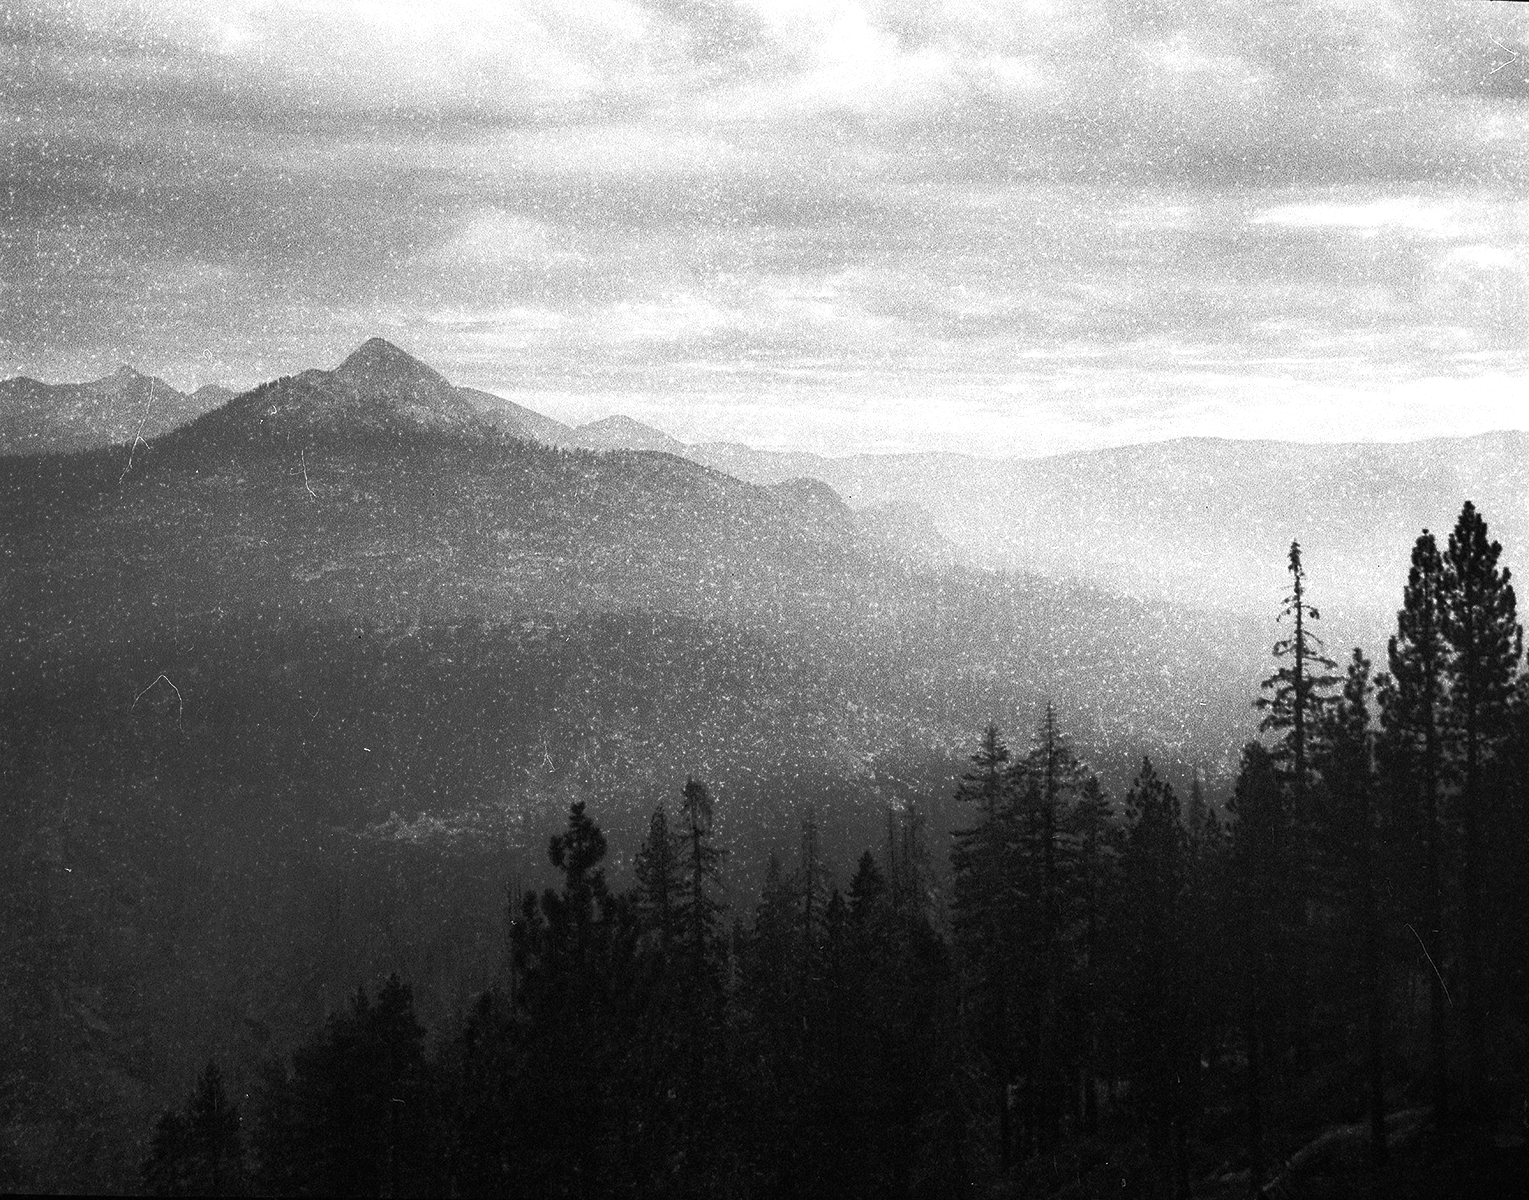 Yosemite Valley - SFX 200